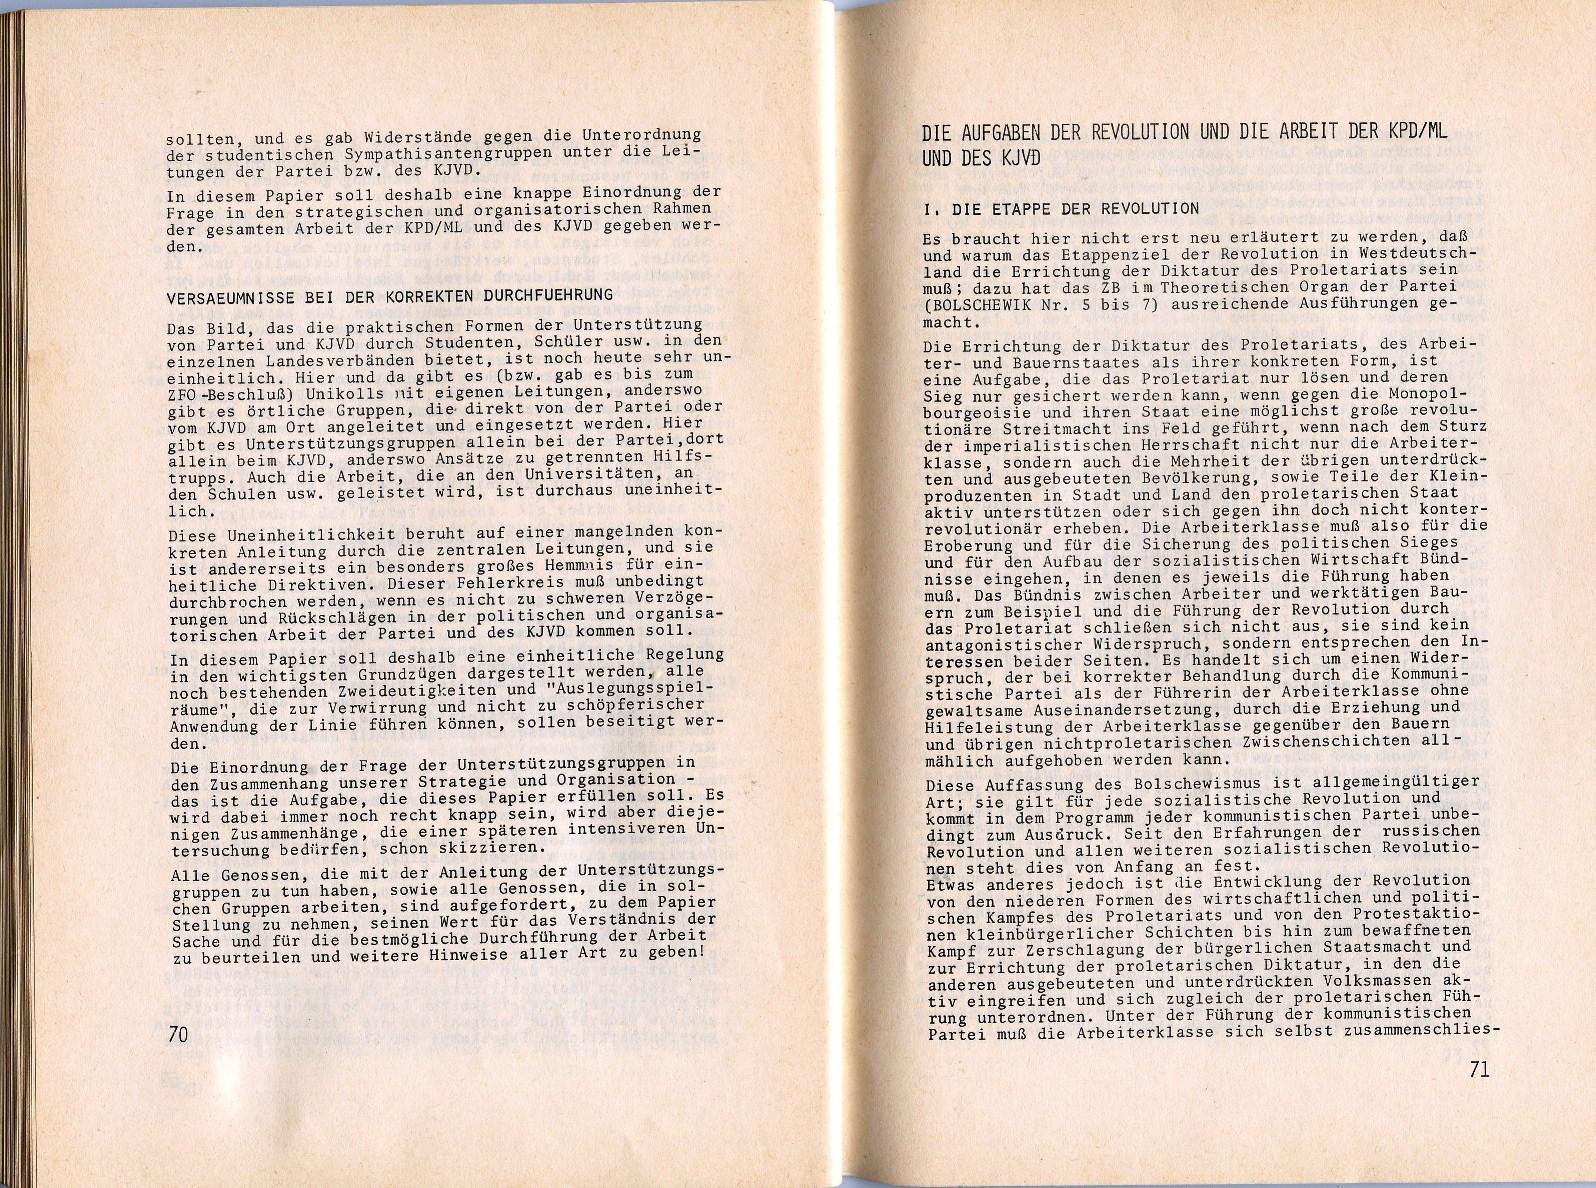 ZB_Parteiarbeiter_1971_07_37